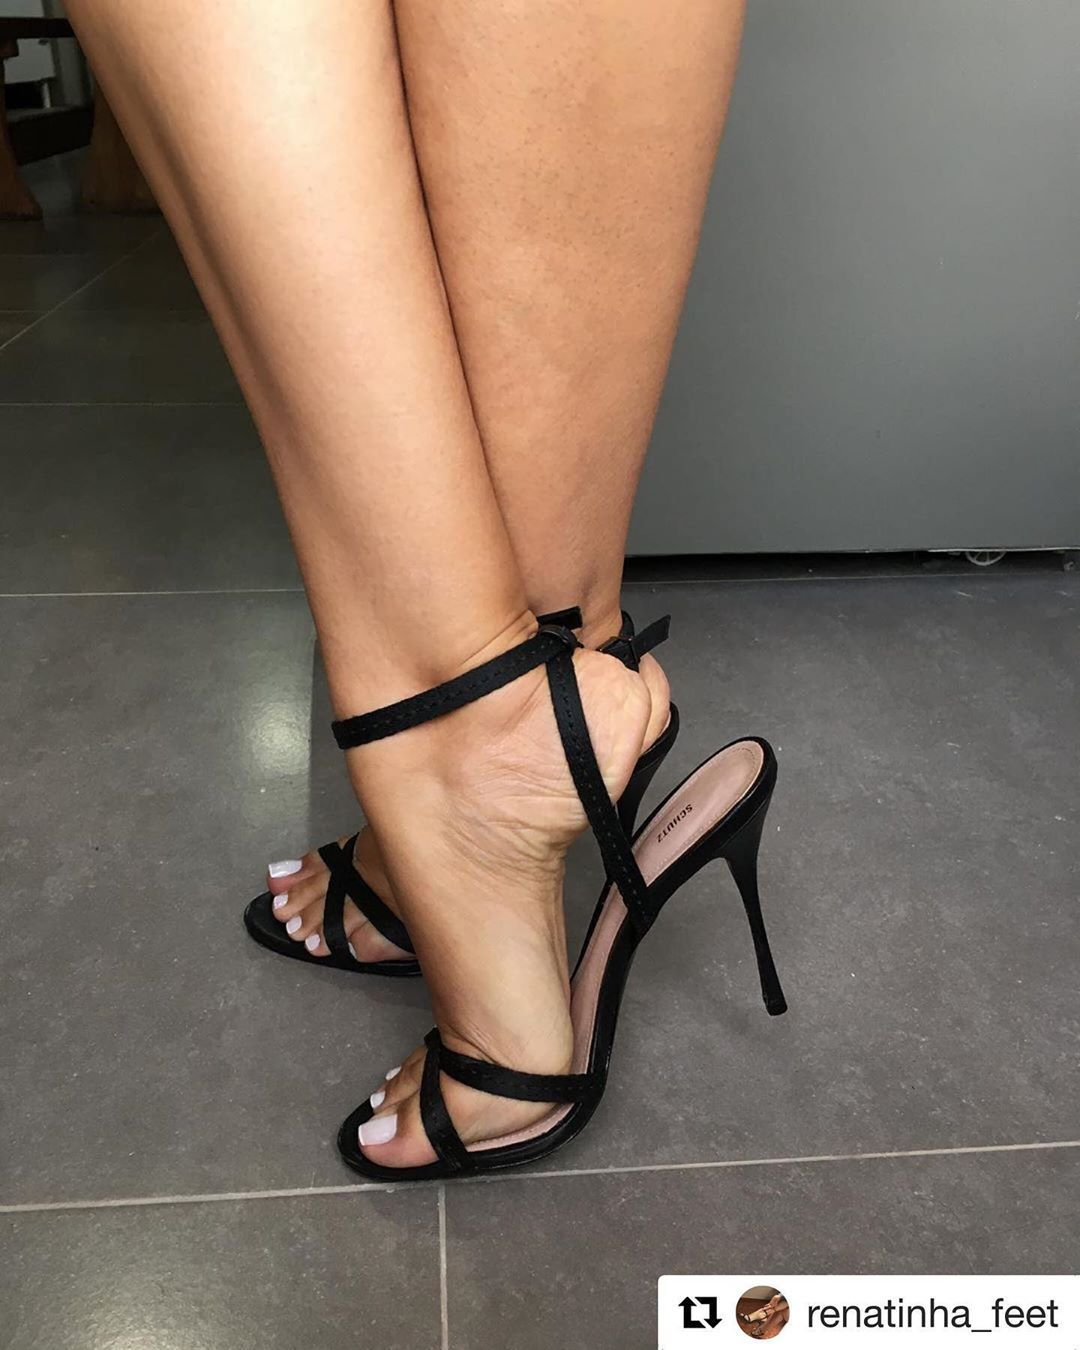 #Repost @renatinha_feet with @get__repost #heelsaddict #perfectpedi #youknowit #..., #charliesfootangelz #fashionheels #fashionshoesaddict #feet #feetofig #heel #heeladdiction #heelsaddict #heelsfashion #heelsoftheday #heels👠 #higharches #highheelshoes #iloveheels #littletoes #myfeet #perfectpedi #pezinhos #prettyfeet #prettyheels #rednails #repost #shoefie #tacchi #tacco #toes #youknowit